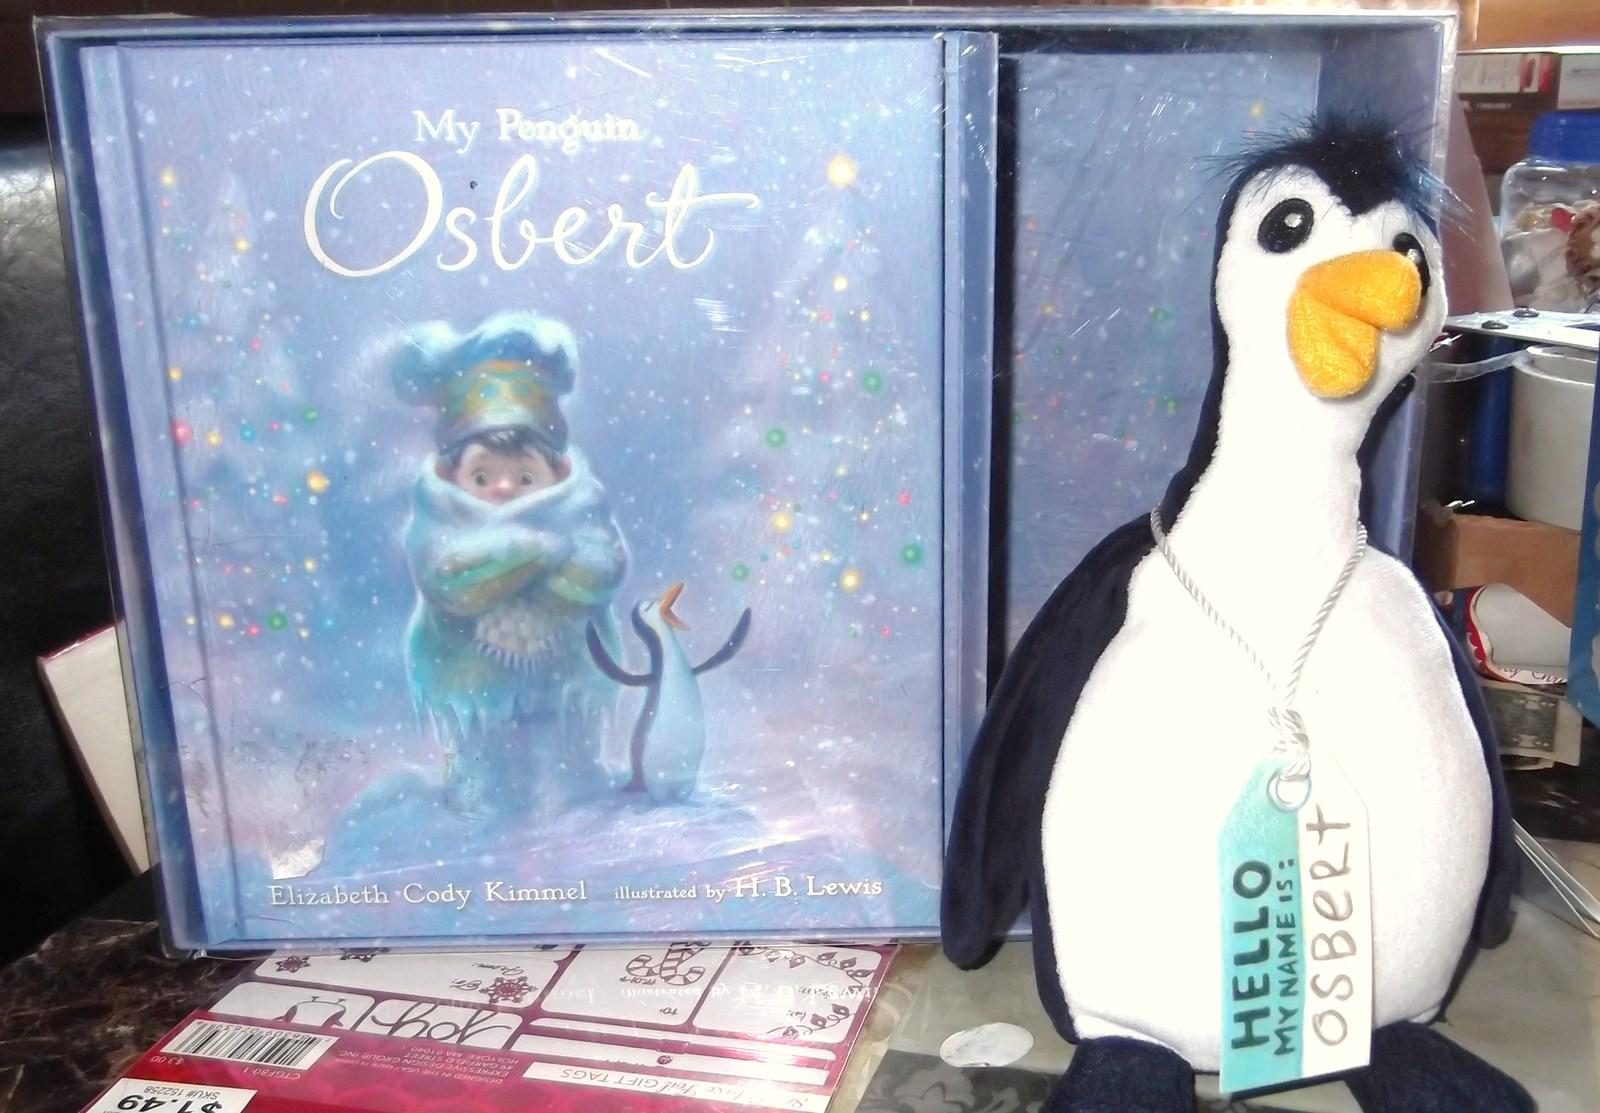 My Penguin Osbert Plush Toy & Book Gift Set - $19.99